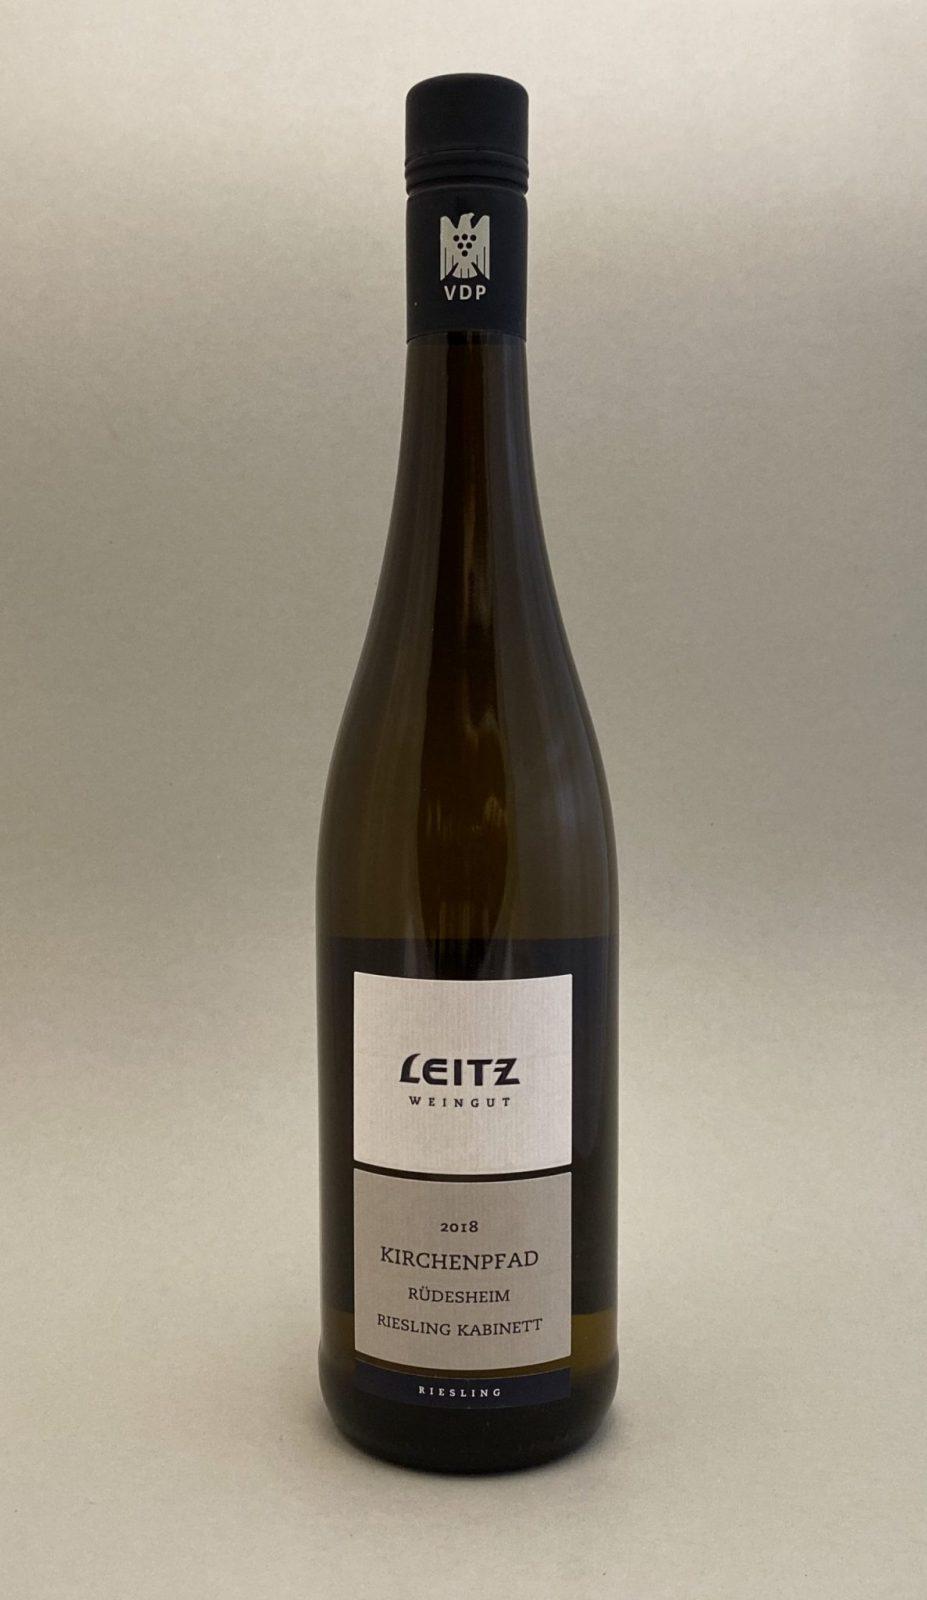 LEITZ Riesling 2018, vinoteka Bratislava Sunny wines slnecnice mesto, petrzalka, vino biele z Nemecka